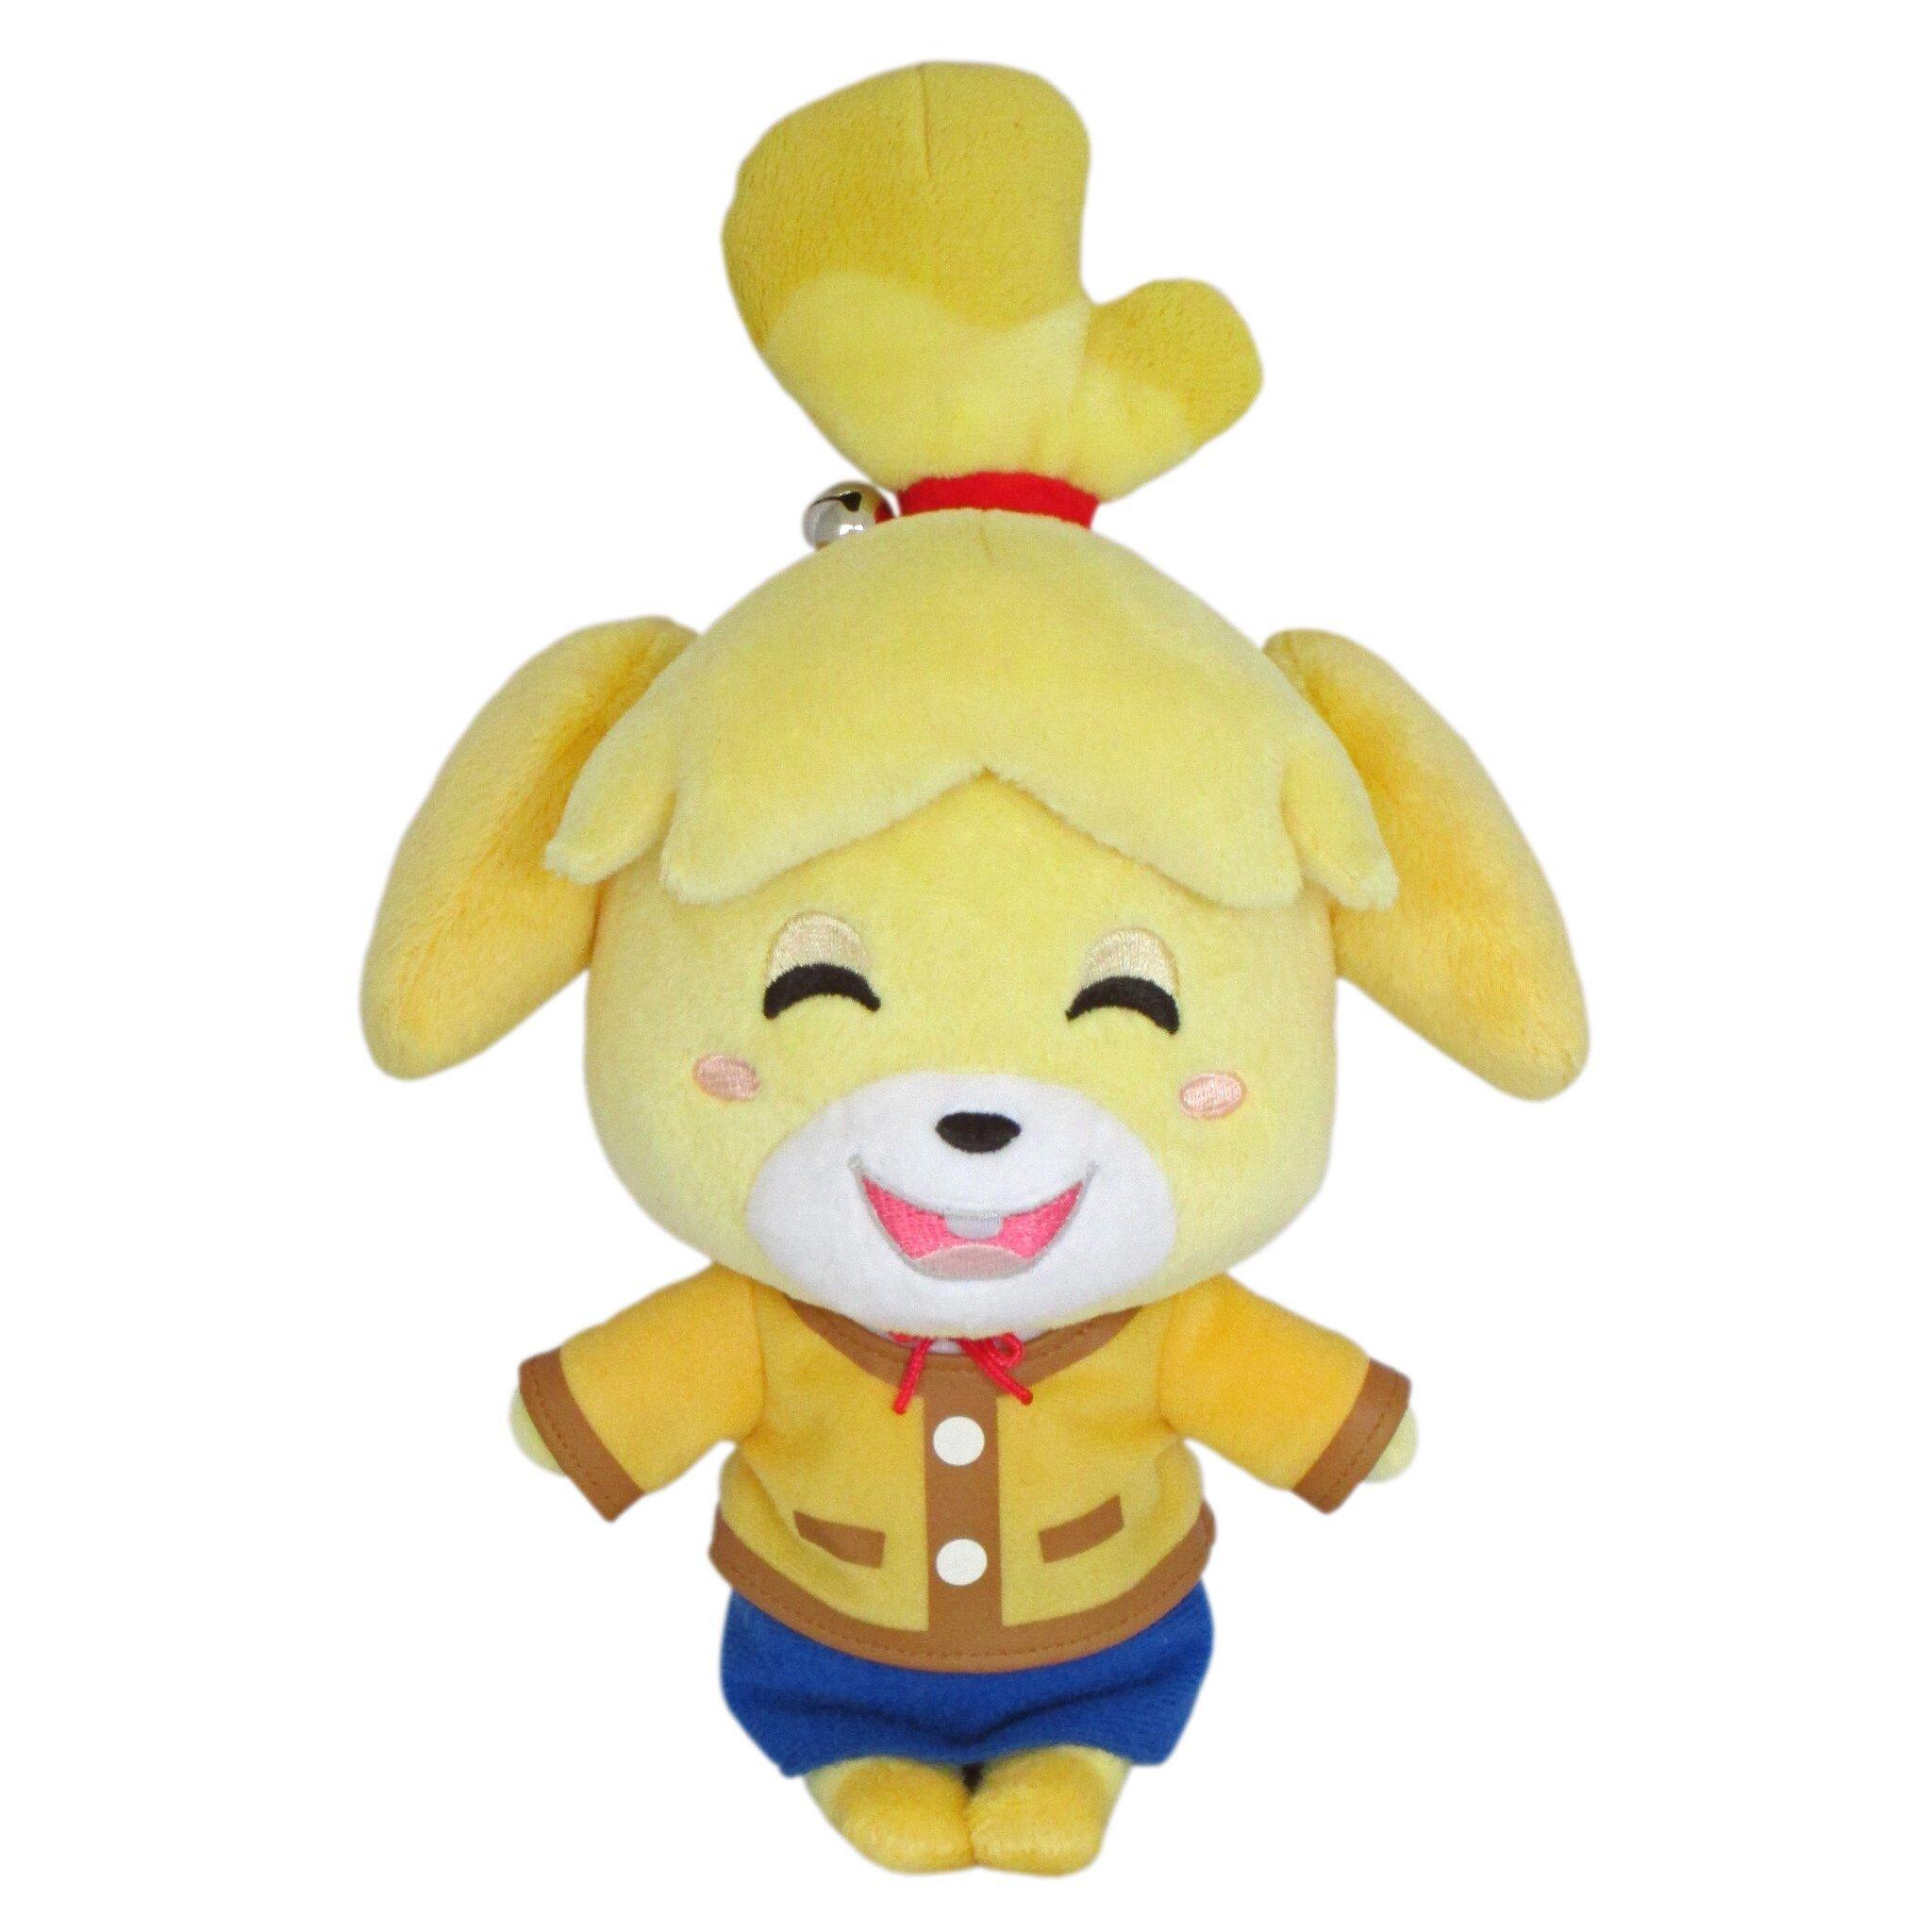 smiling-isabelle-animal-crossing-plush (1)